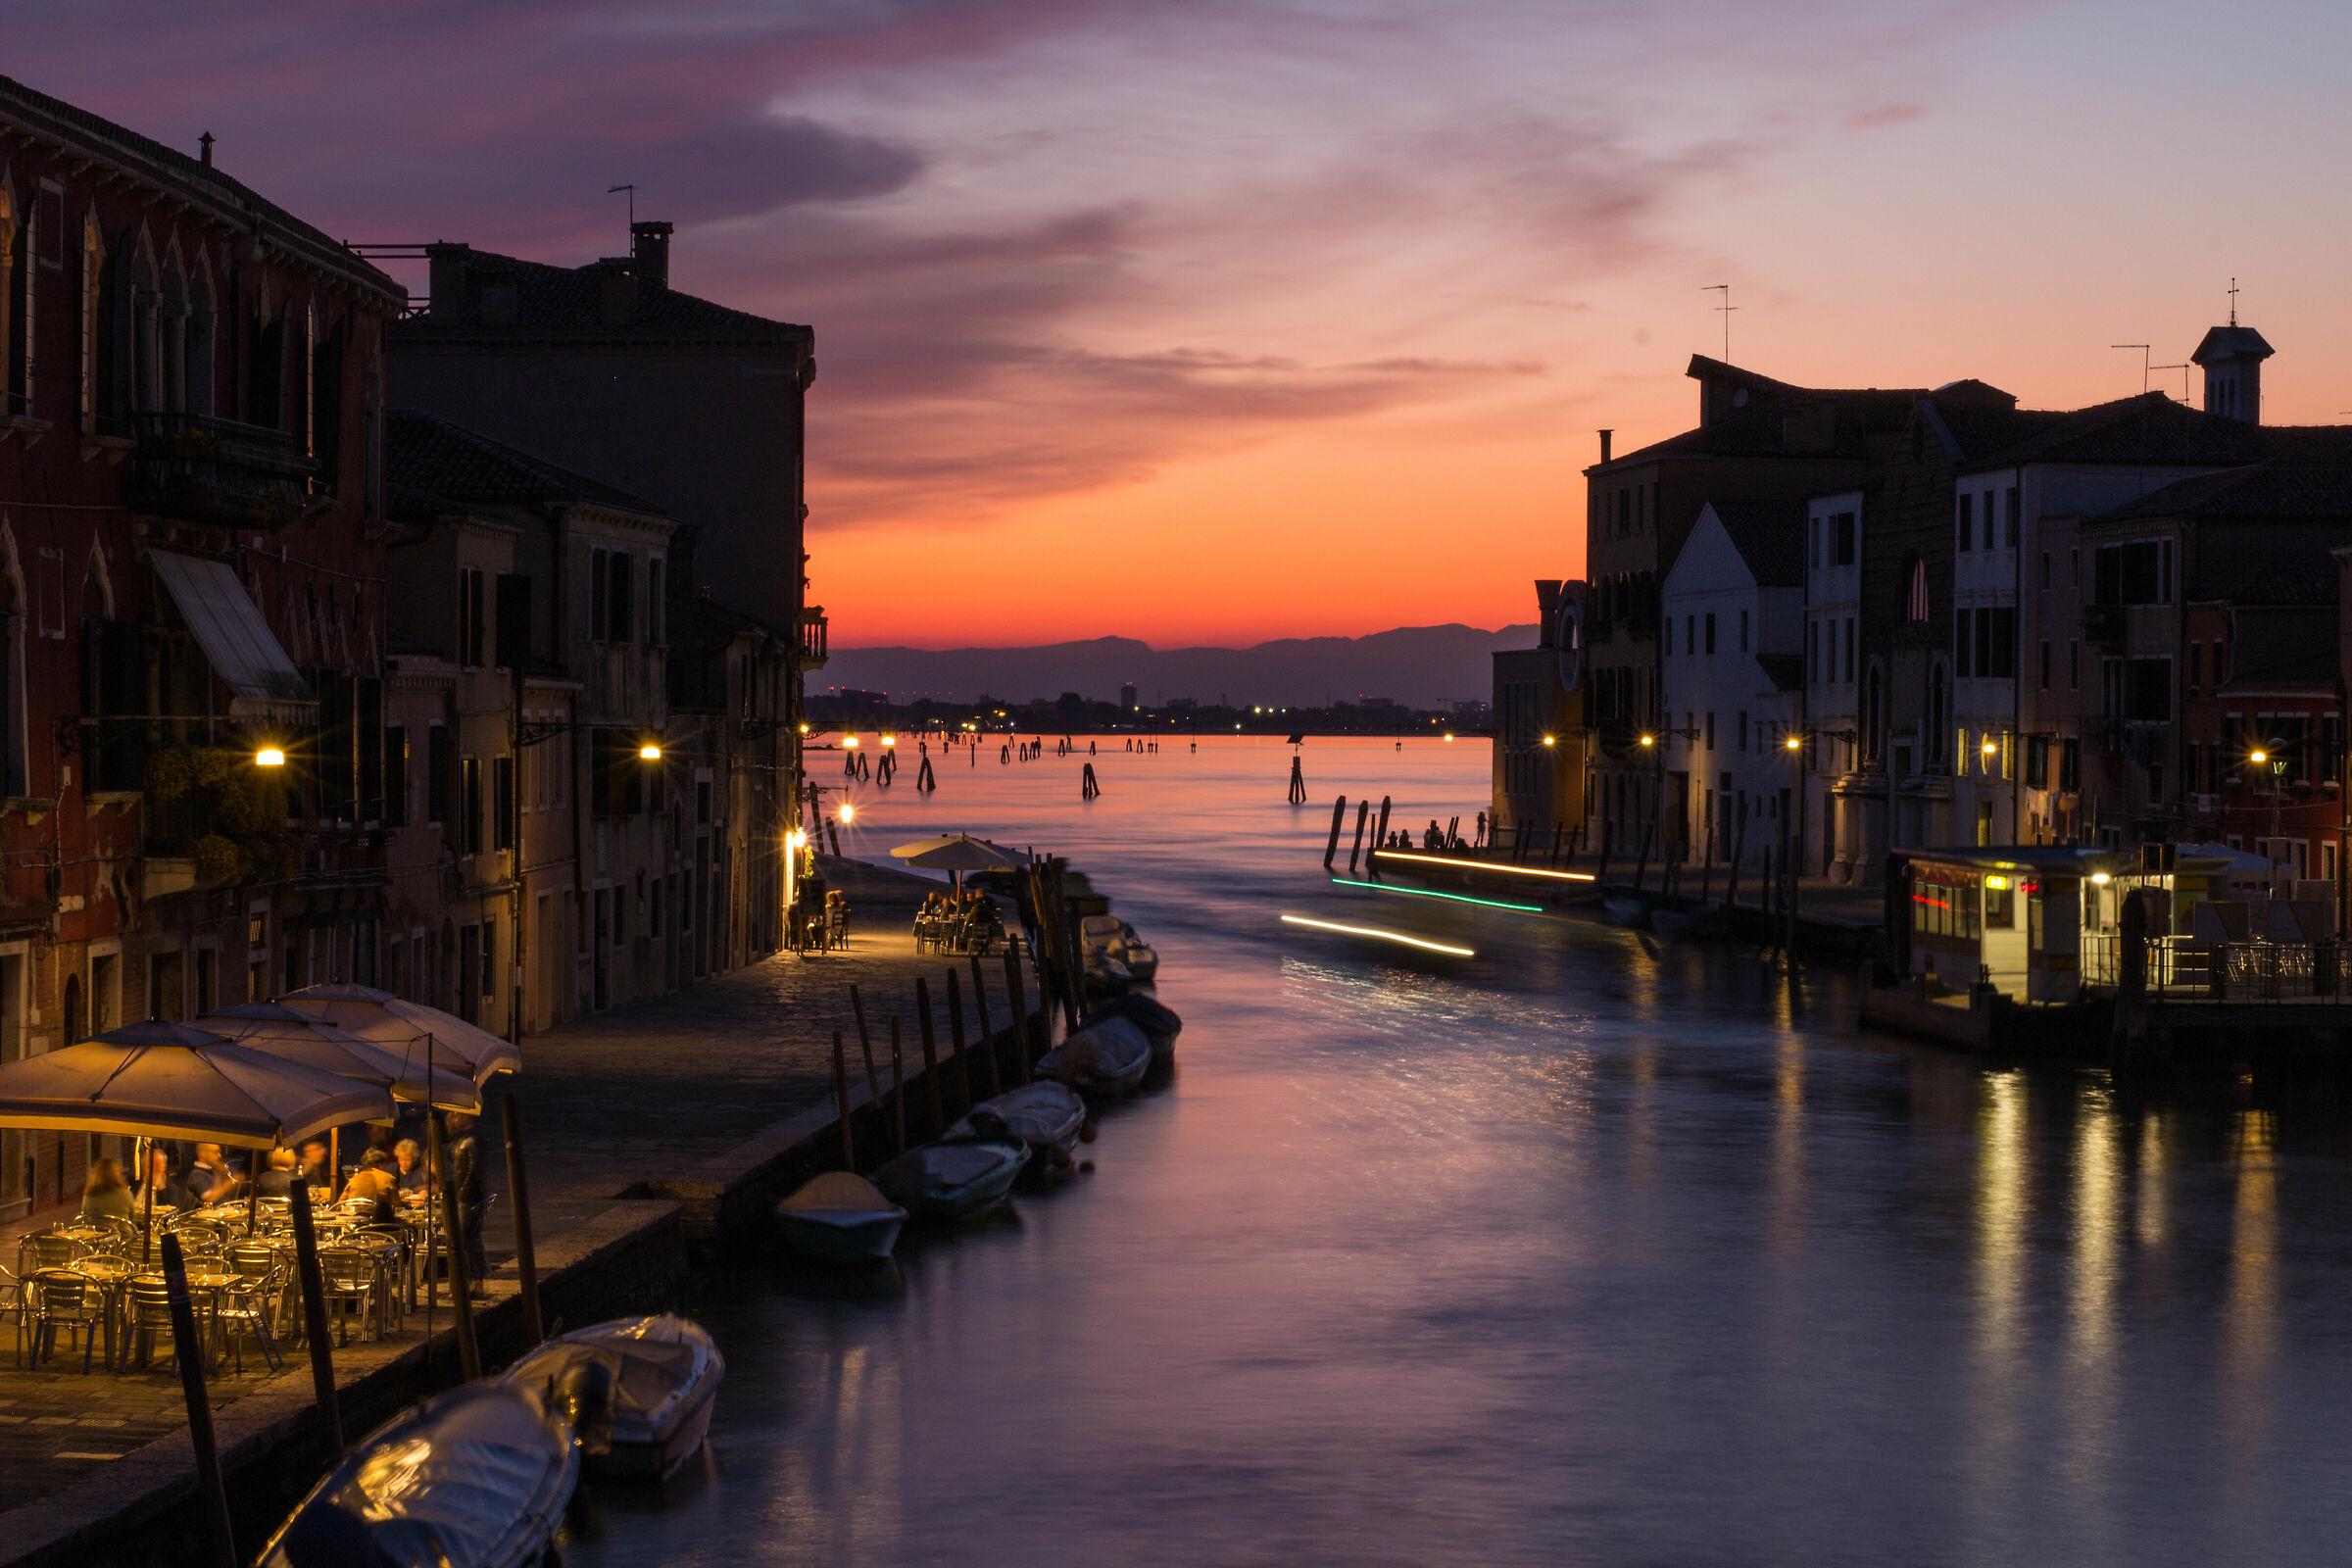 Sunset at the Bridge of Three Arches...